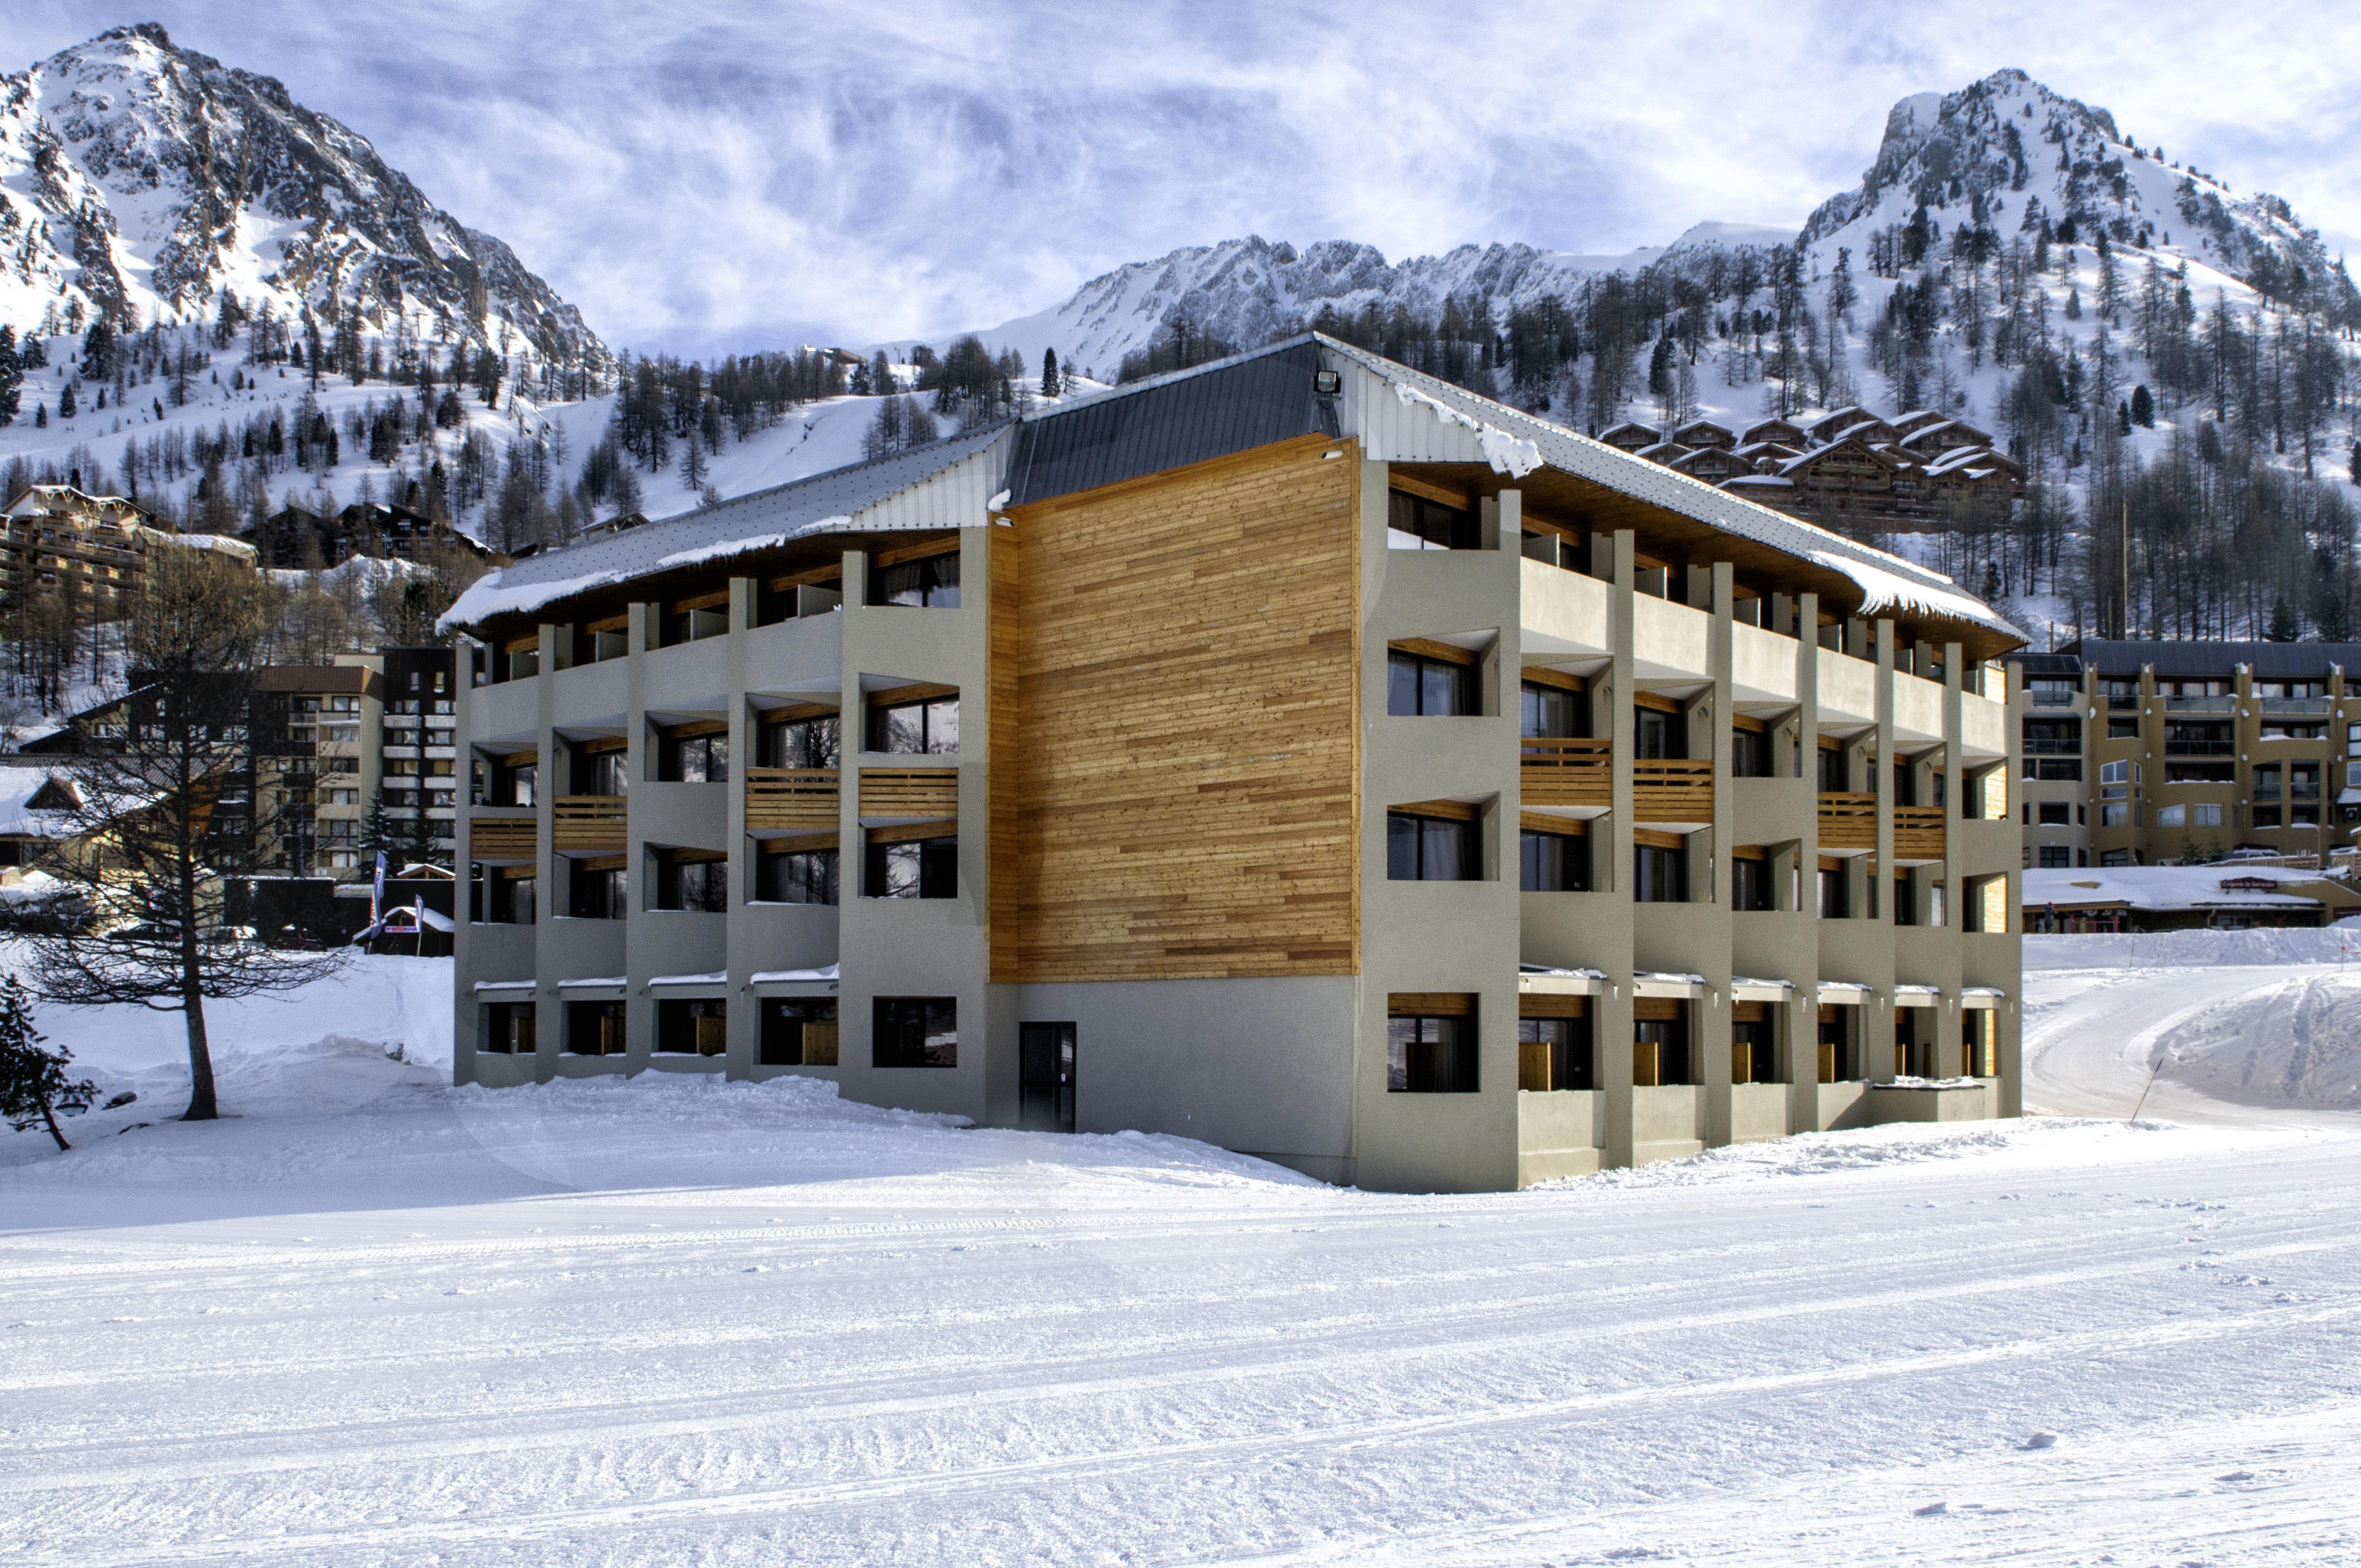 Ferienwohnung le new chastillon in isola 2000 frankreich interhome - Office de tourisme d isola 2000 ...